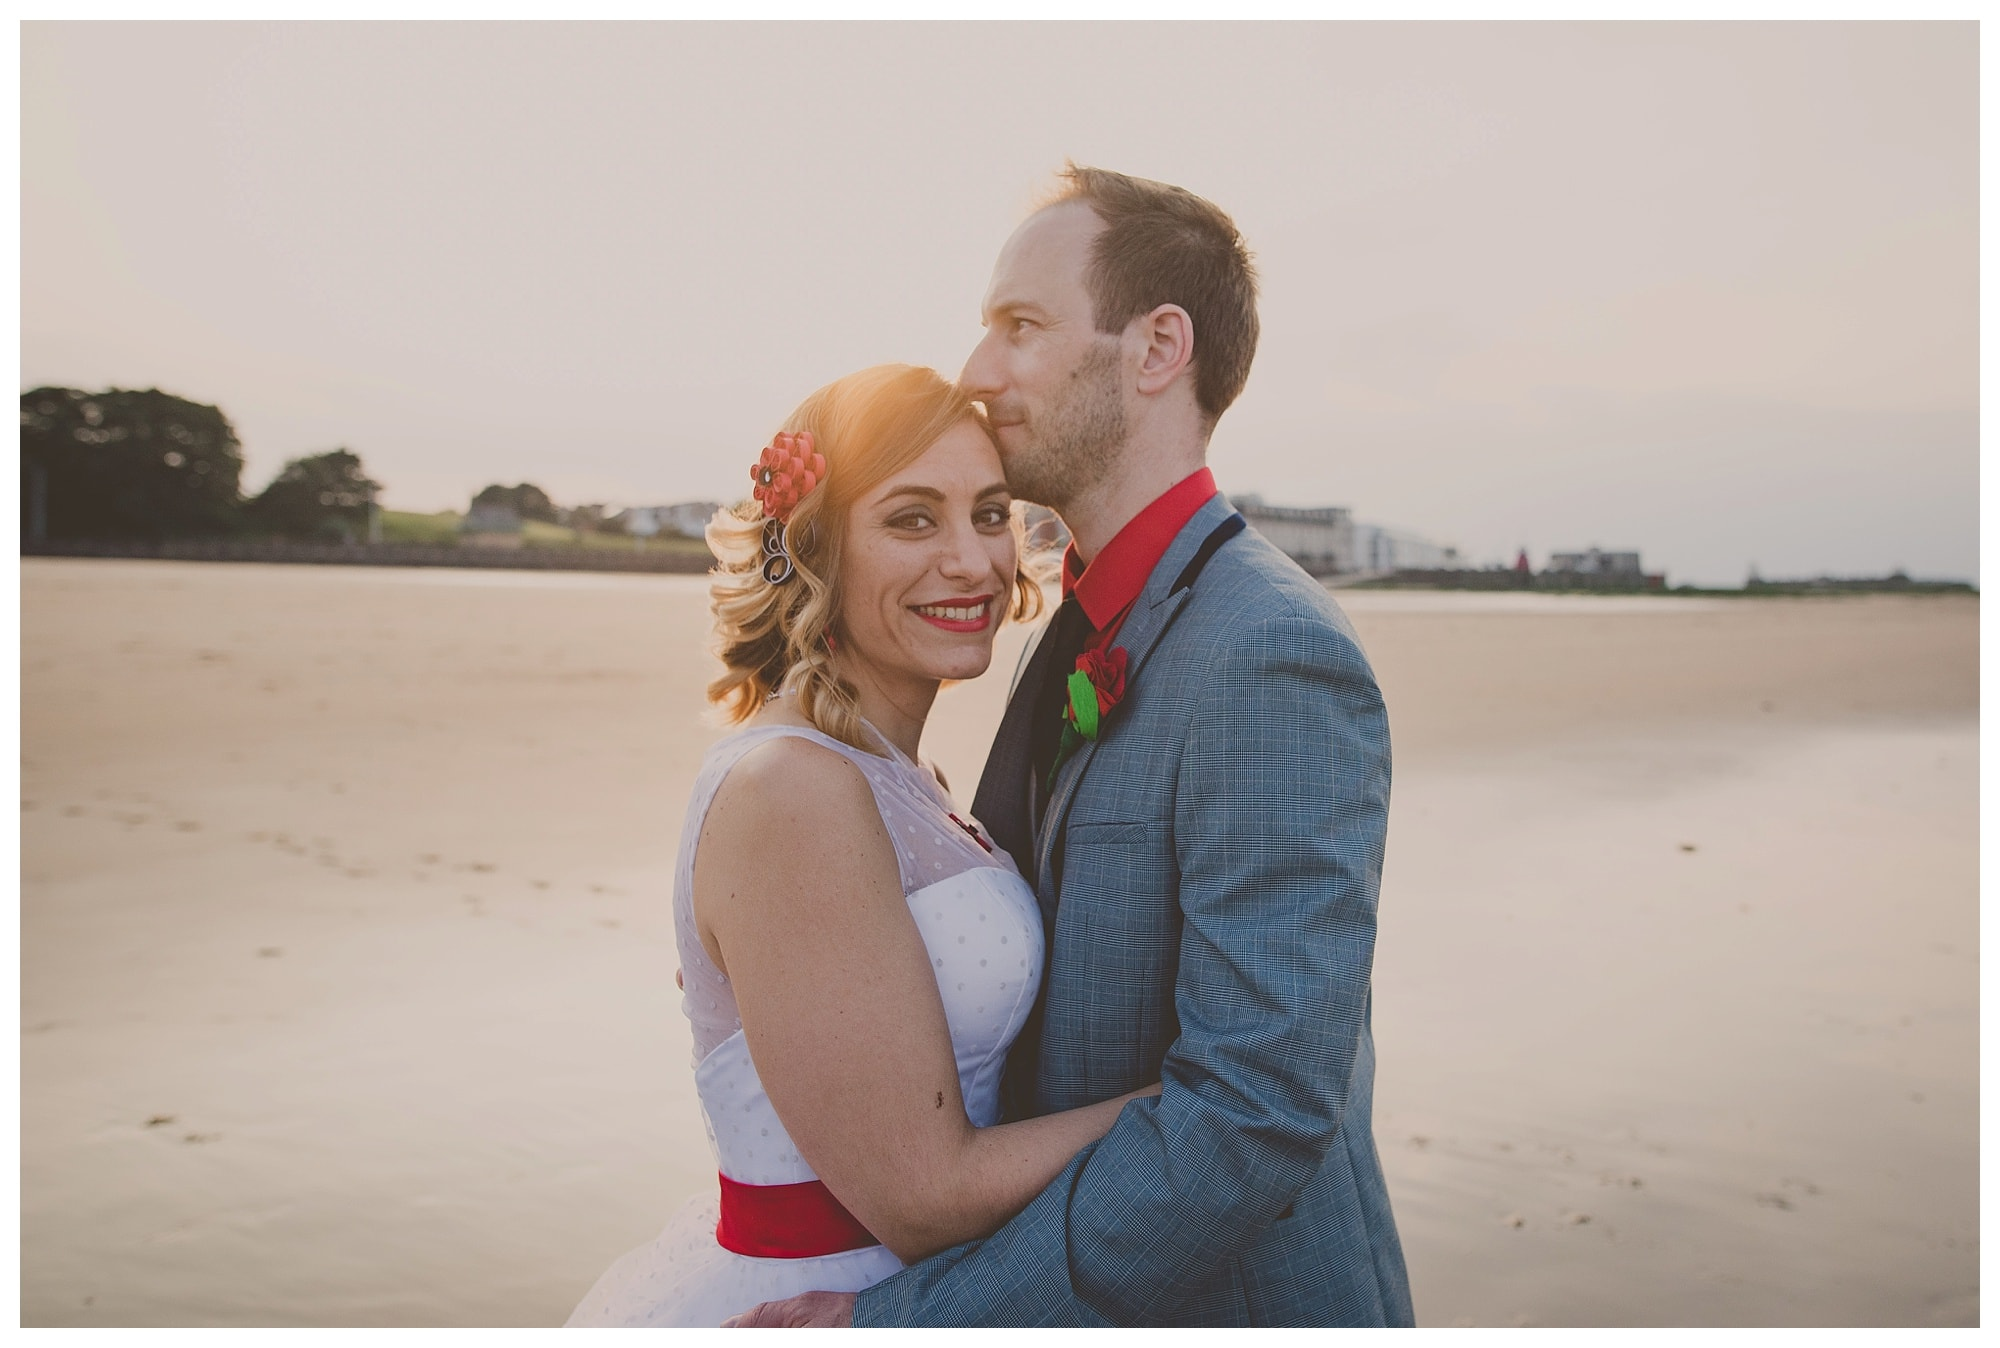 wedding readings, staffordshire wedding photography creative wedding photography natural fun wedding photography